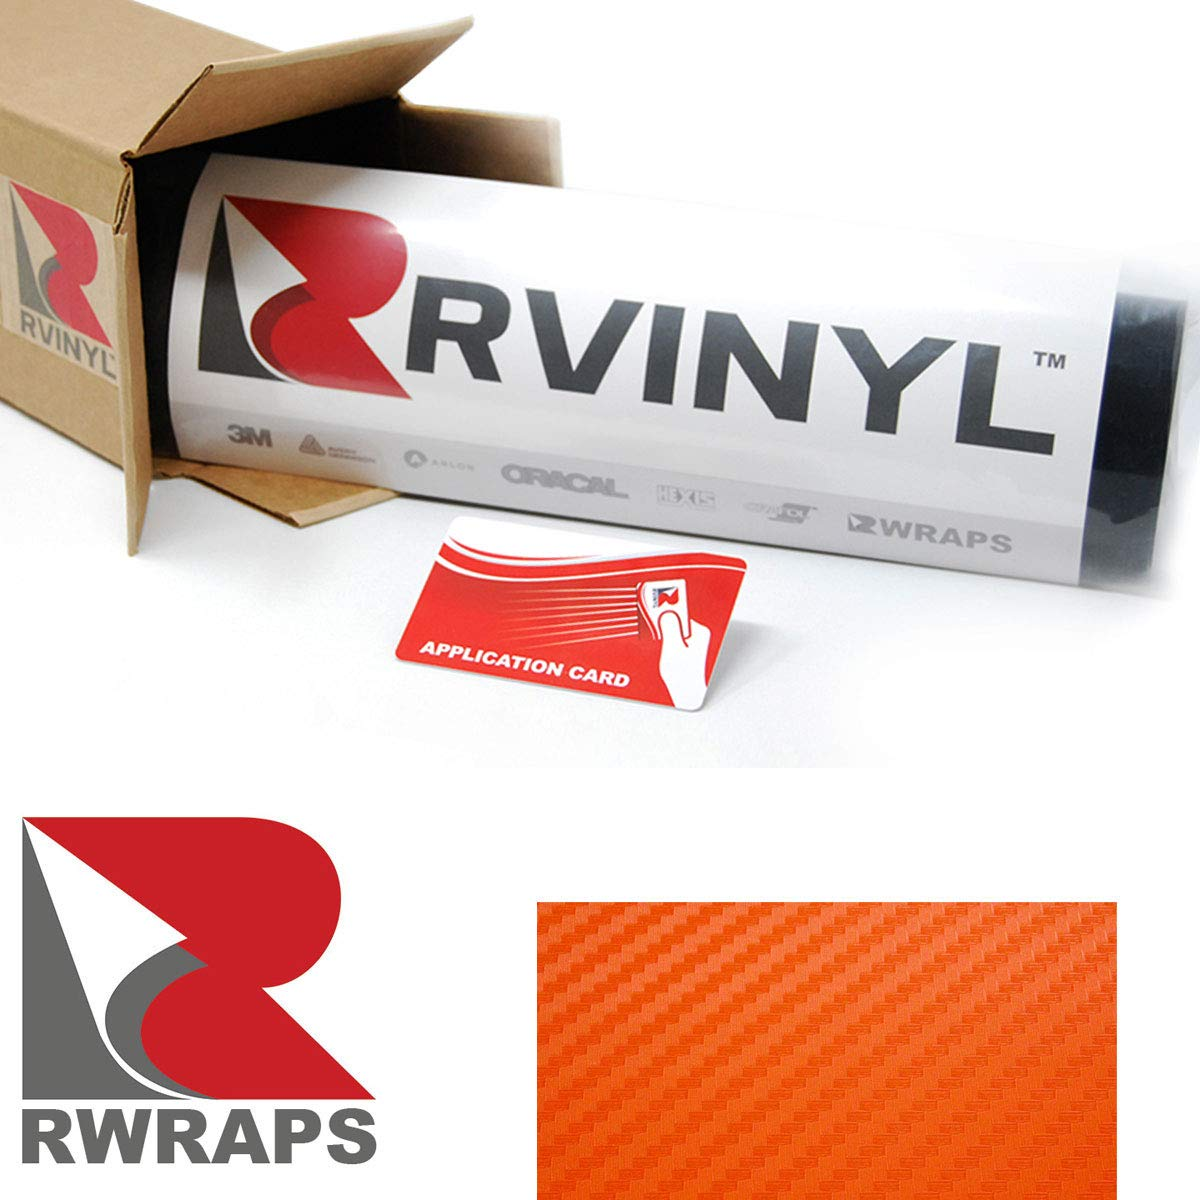 Sample Size Vinyl Vehicle Car Wrap Film Sheet Roll Rvinyl Rwraps 3D Orange Carbon Fiber 4in x 6in